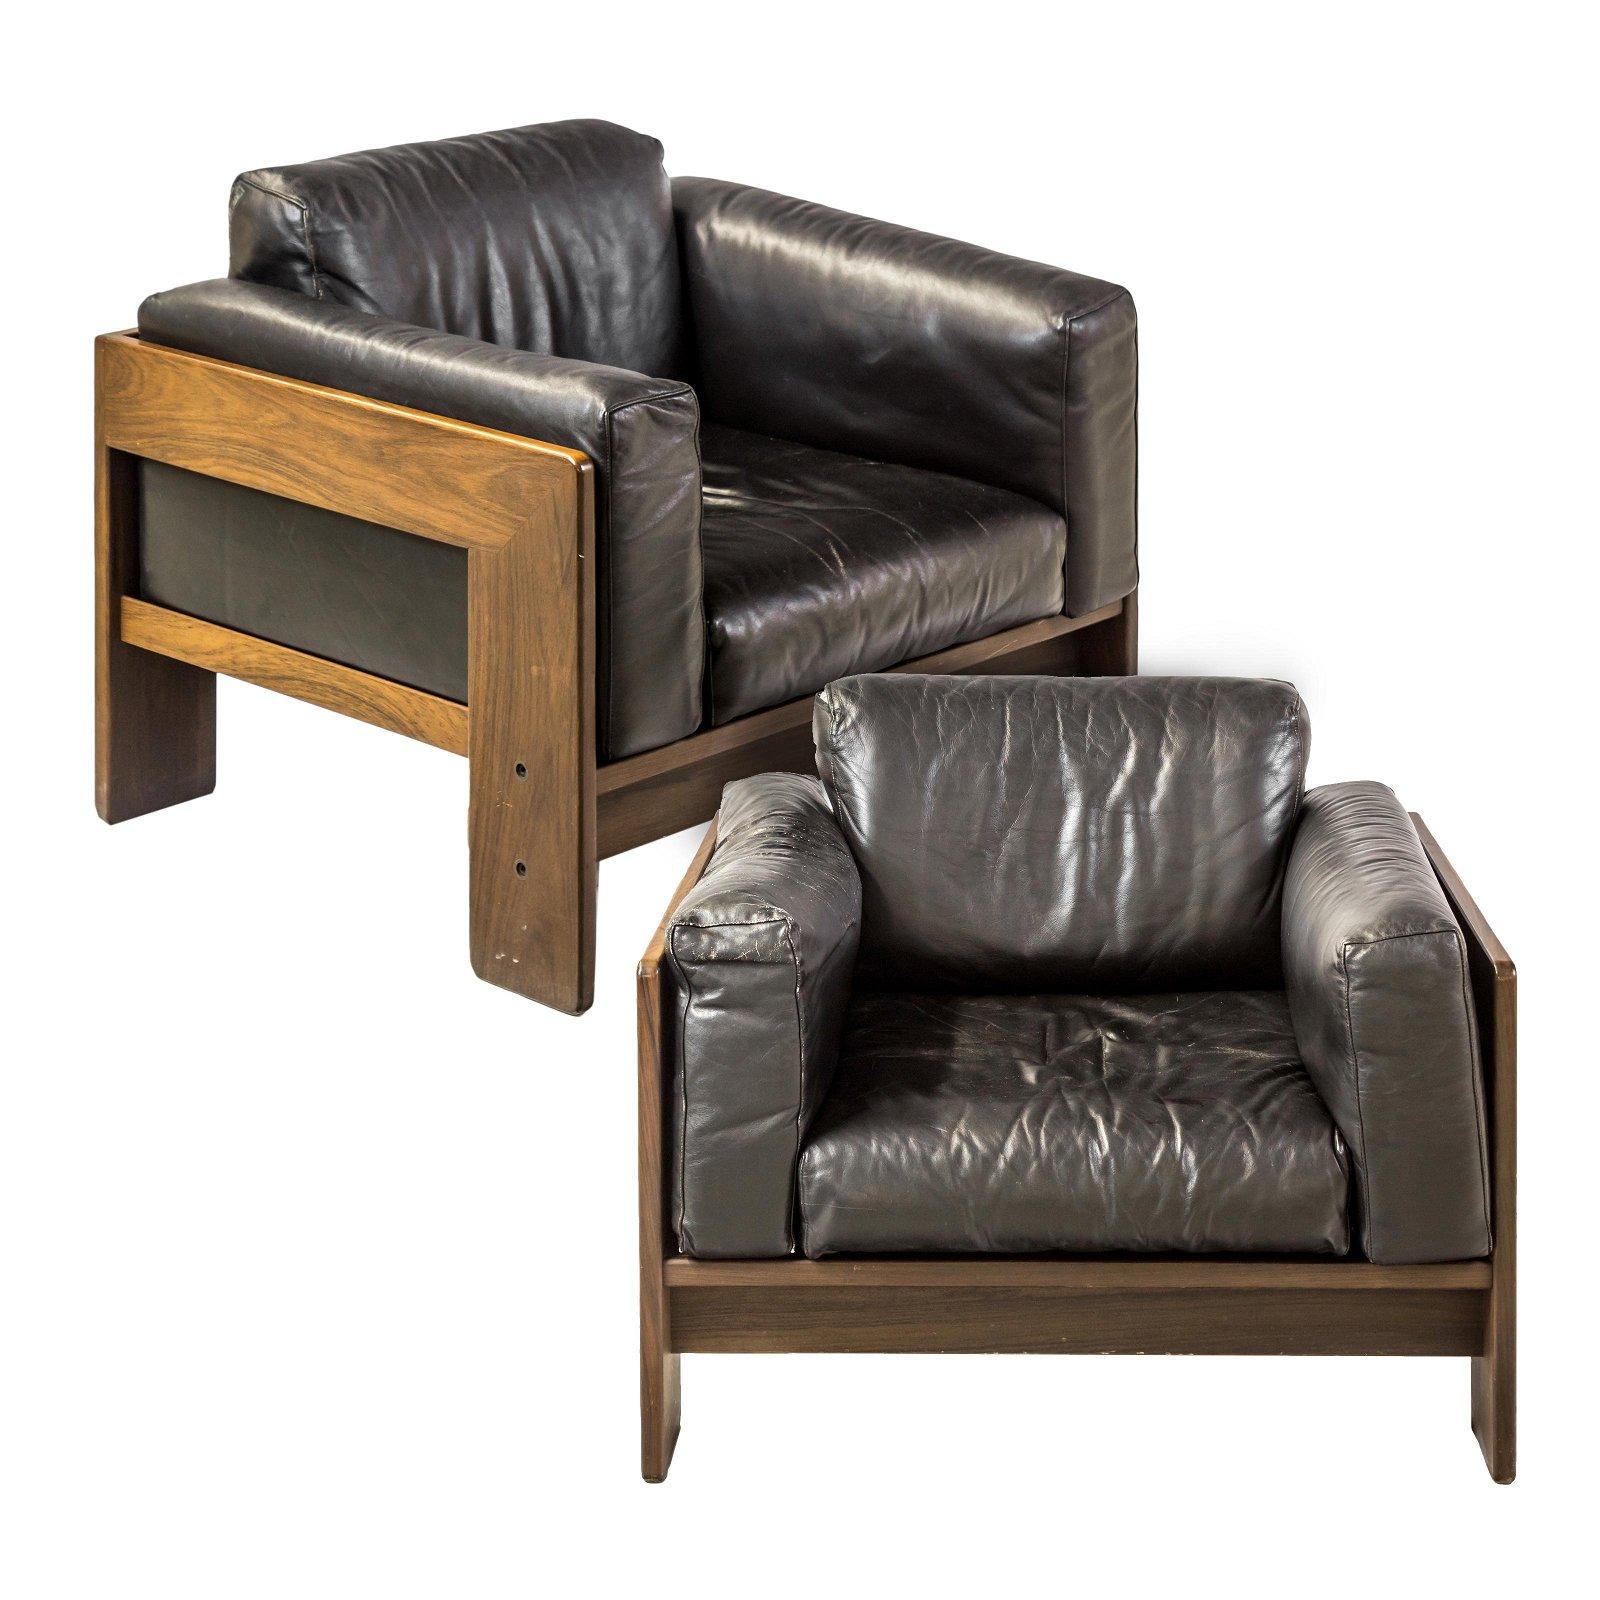 PR Tobia Scarpa Gavina Italian Modern Lounge Chair